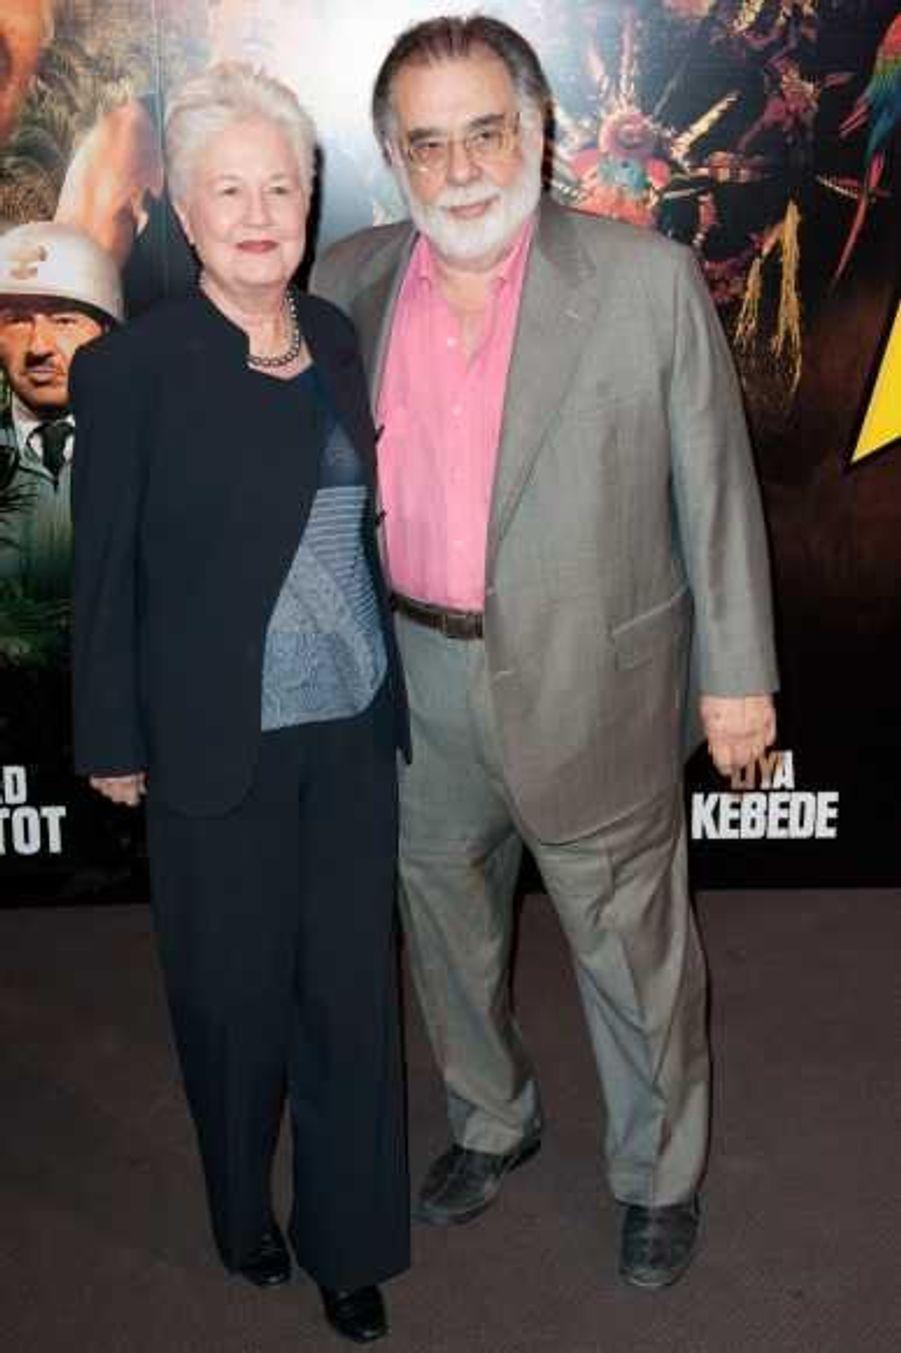 Francis et Eleanor Ford Coppola